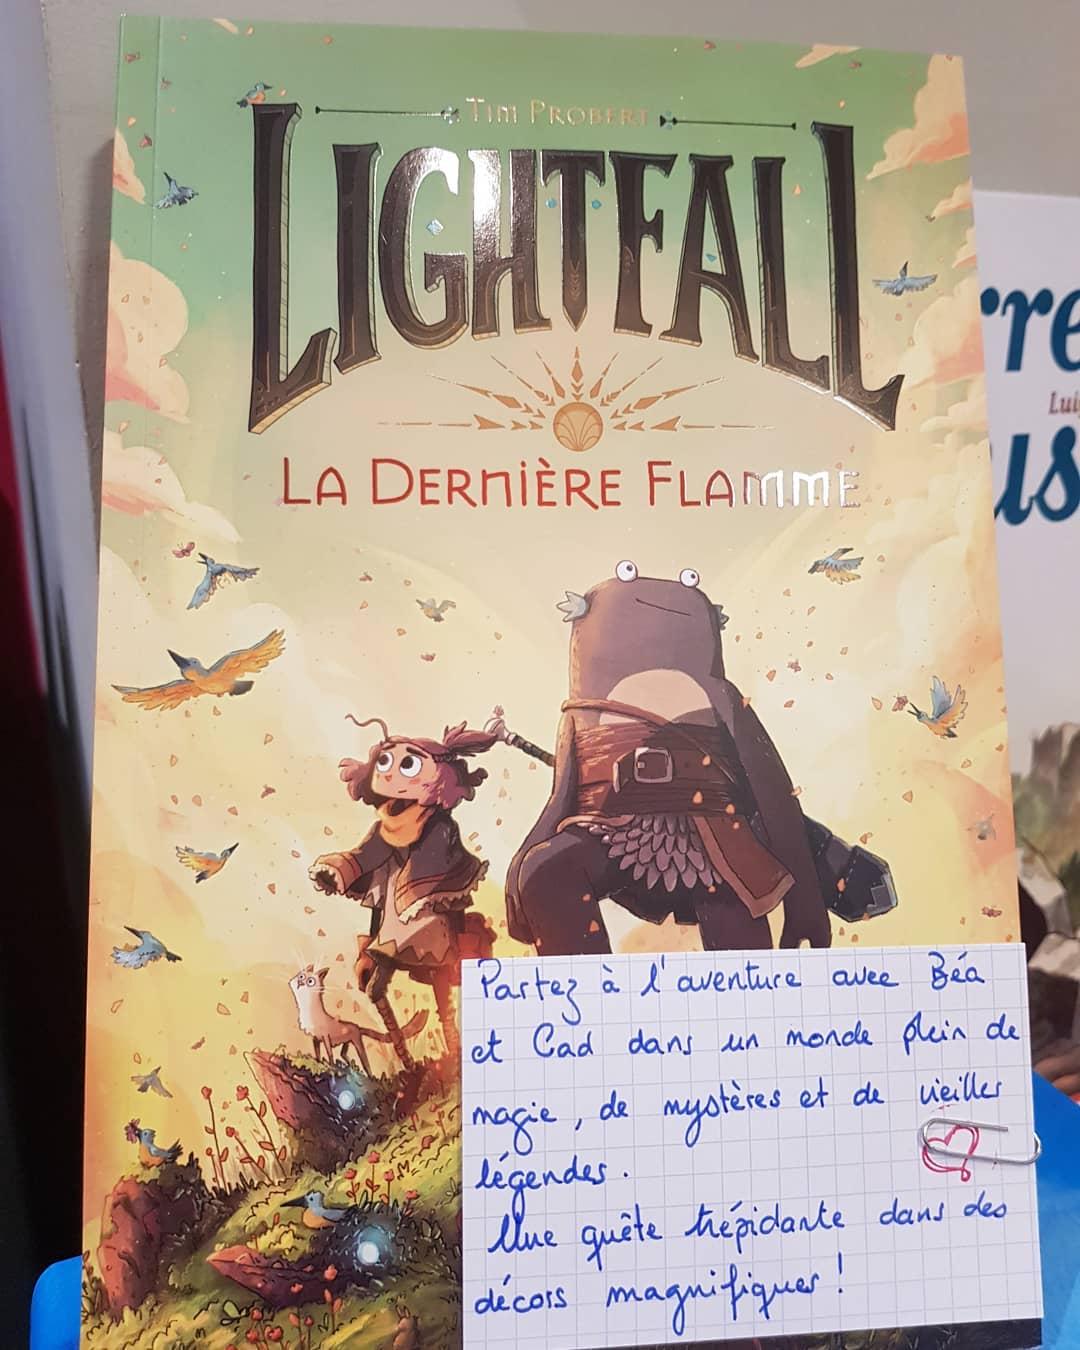 Lightfall